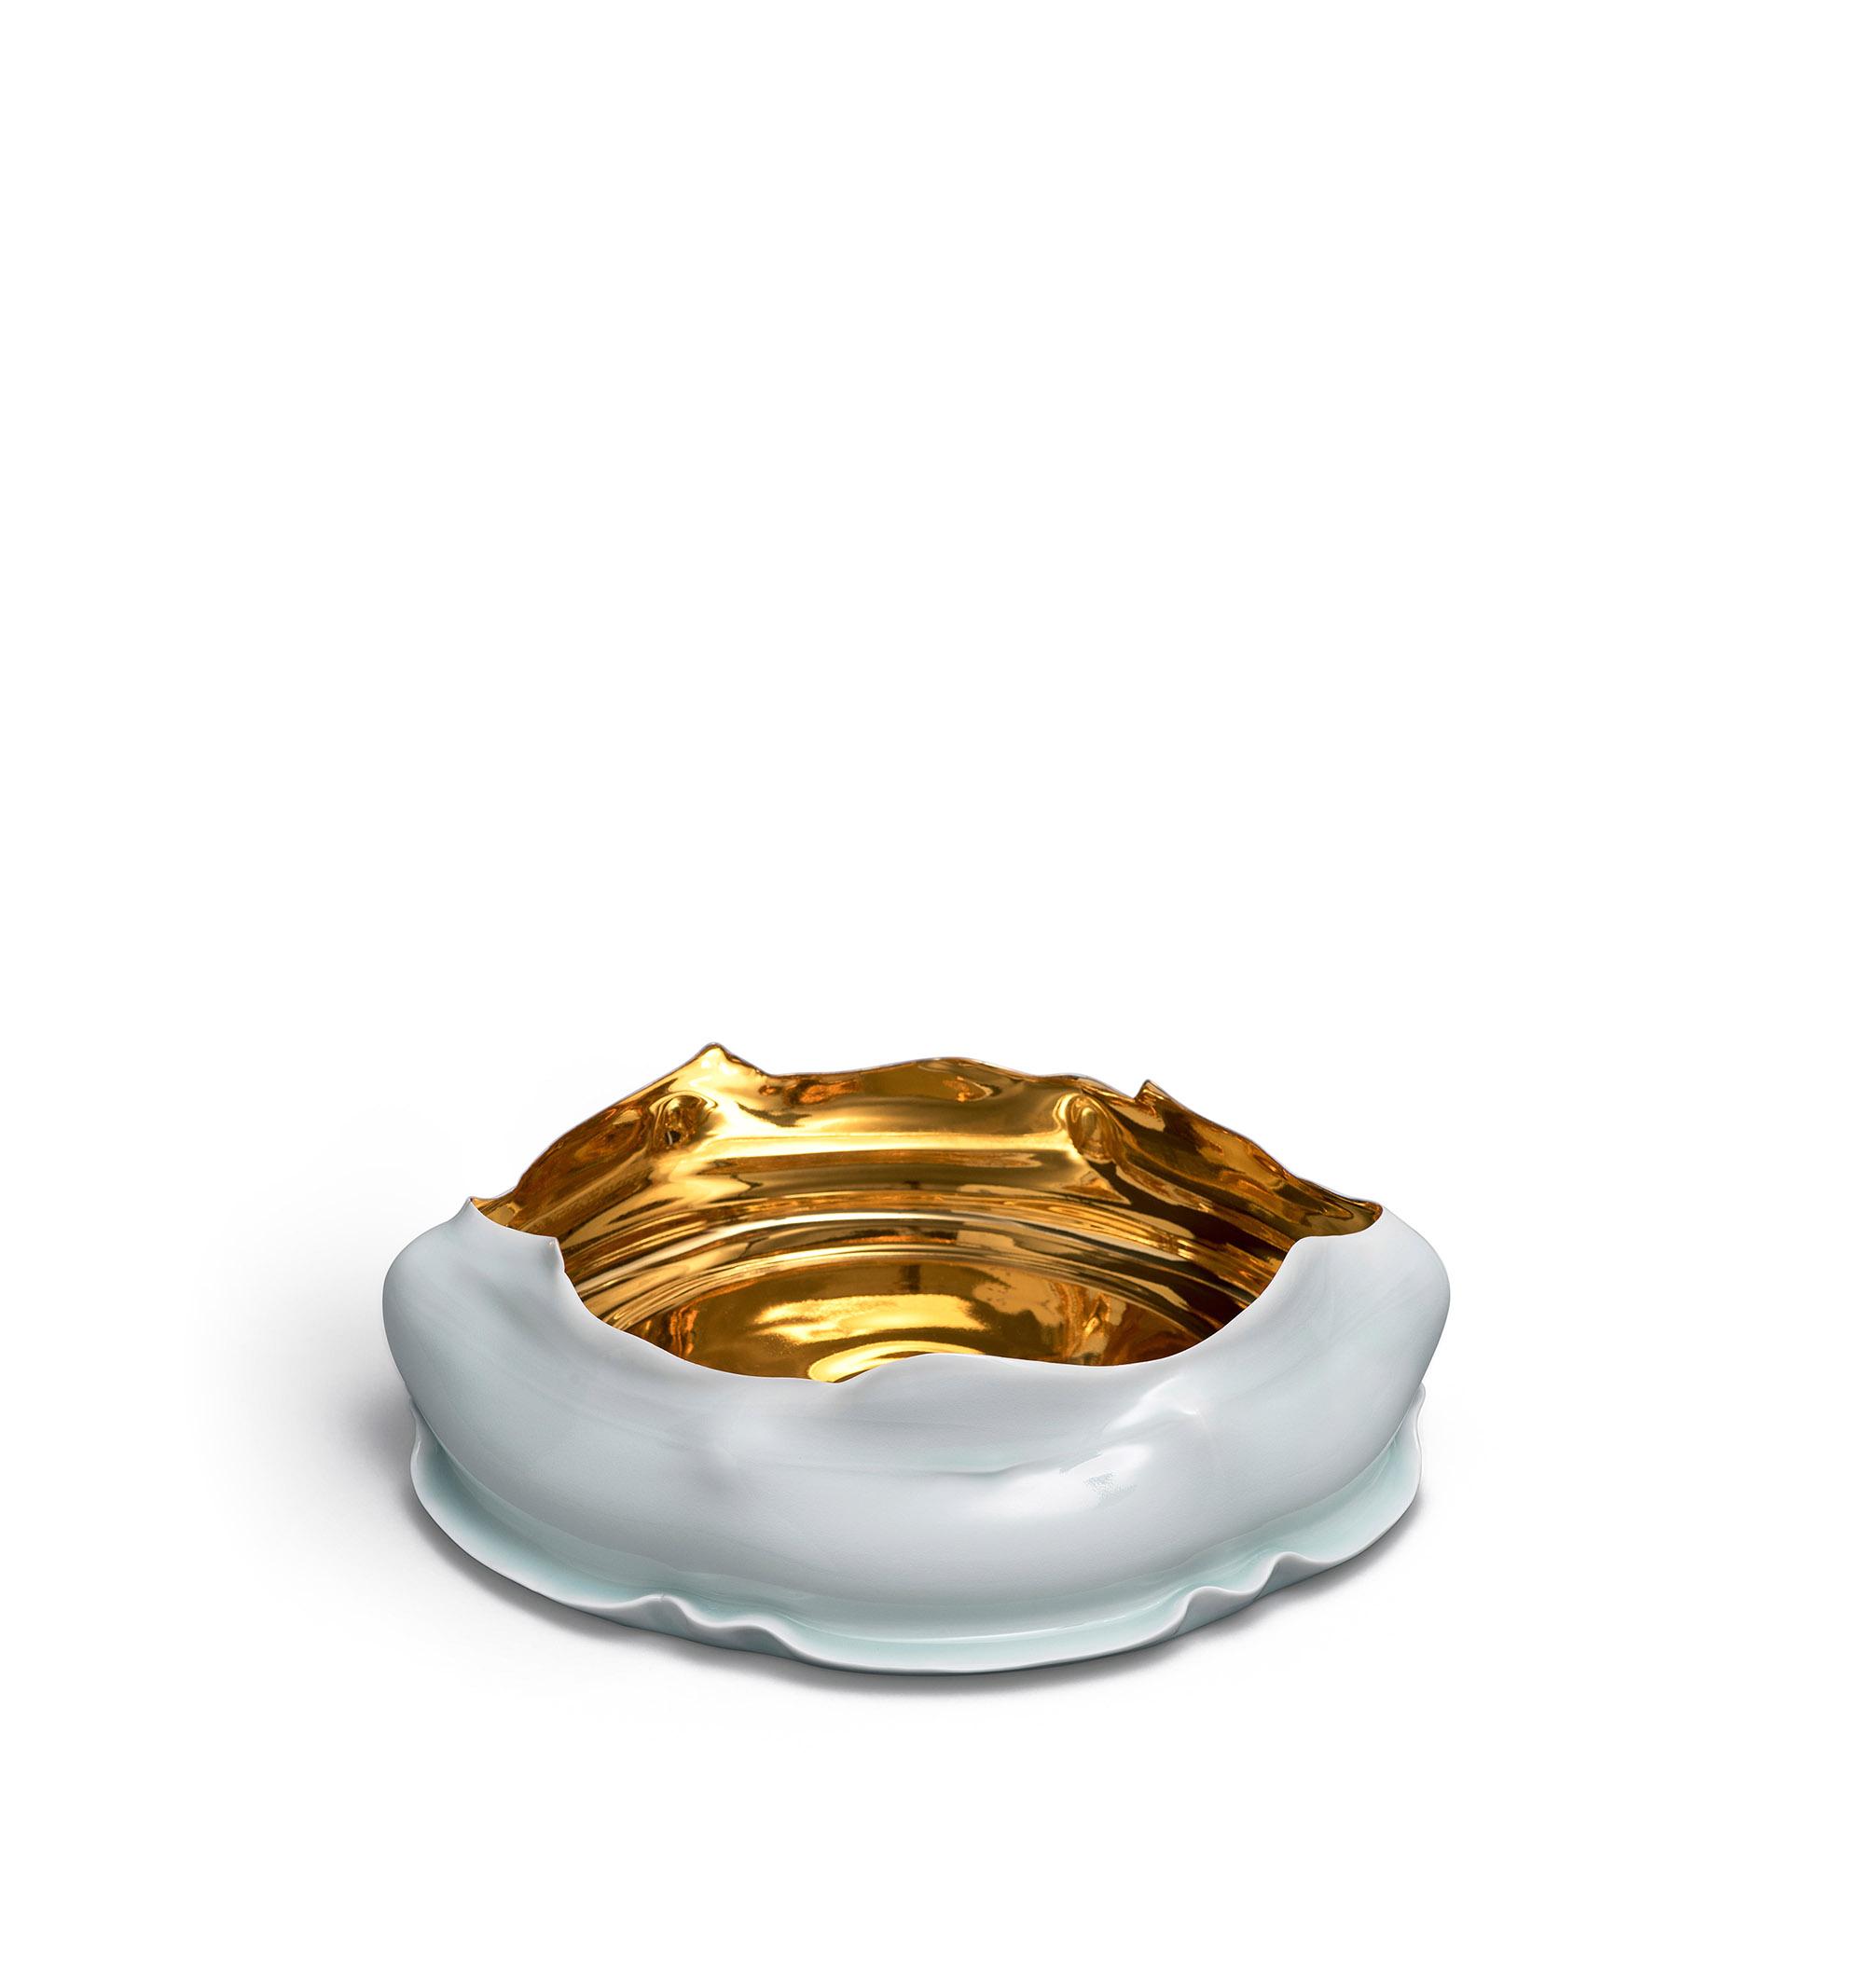 "Takeshi Yasuda, United Kingdom ""Qingbai gold bowl"", porcelain, qingbai glaze, colloidal gold, 418 x 398 x 119 mm (2015)"